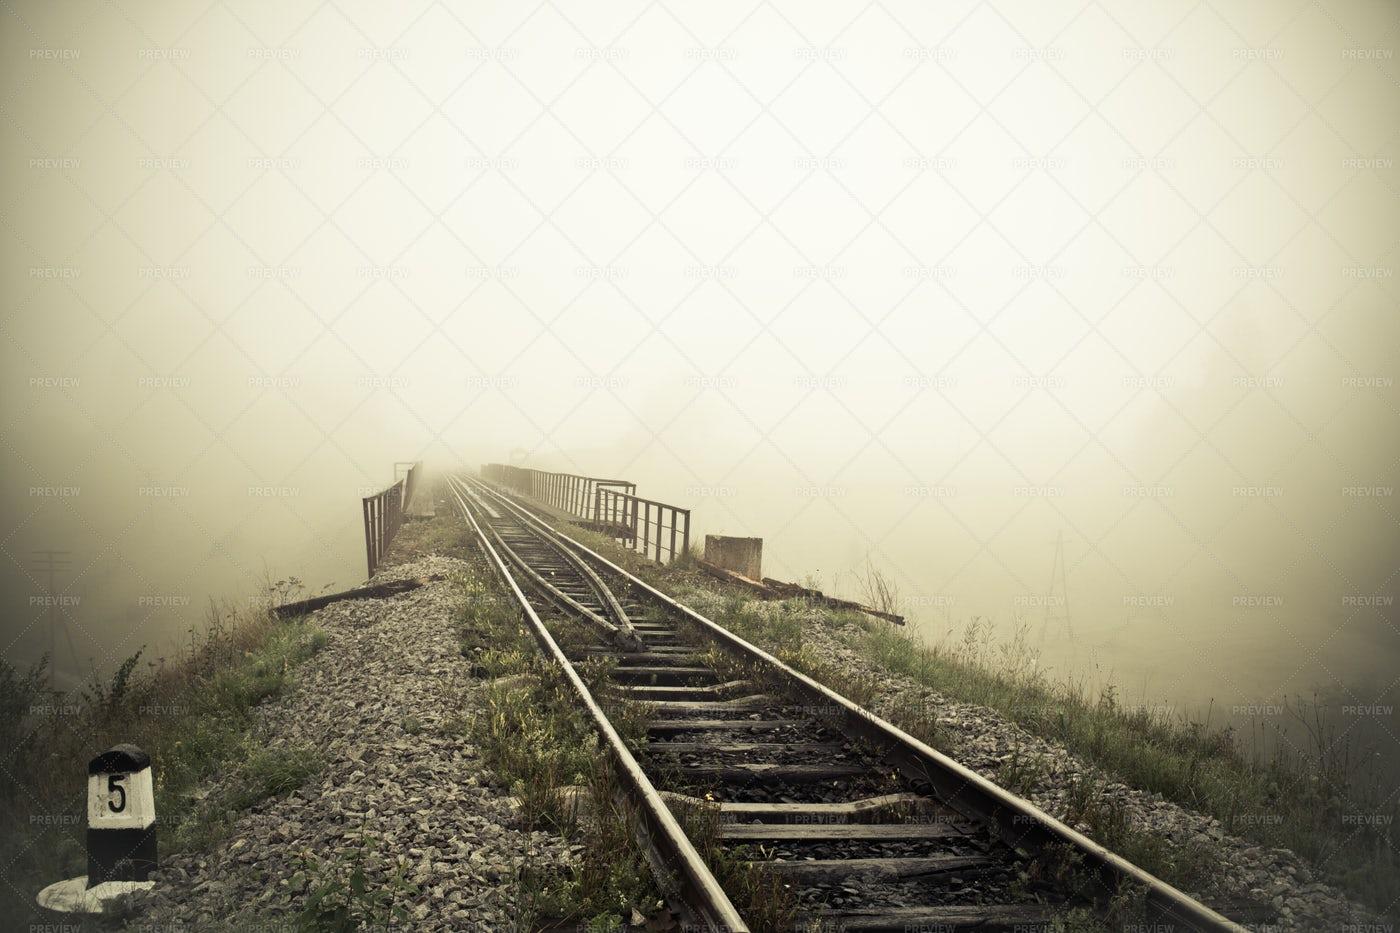 Train Tracks On Foggy Morning: Stock Photos